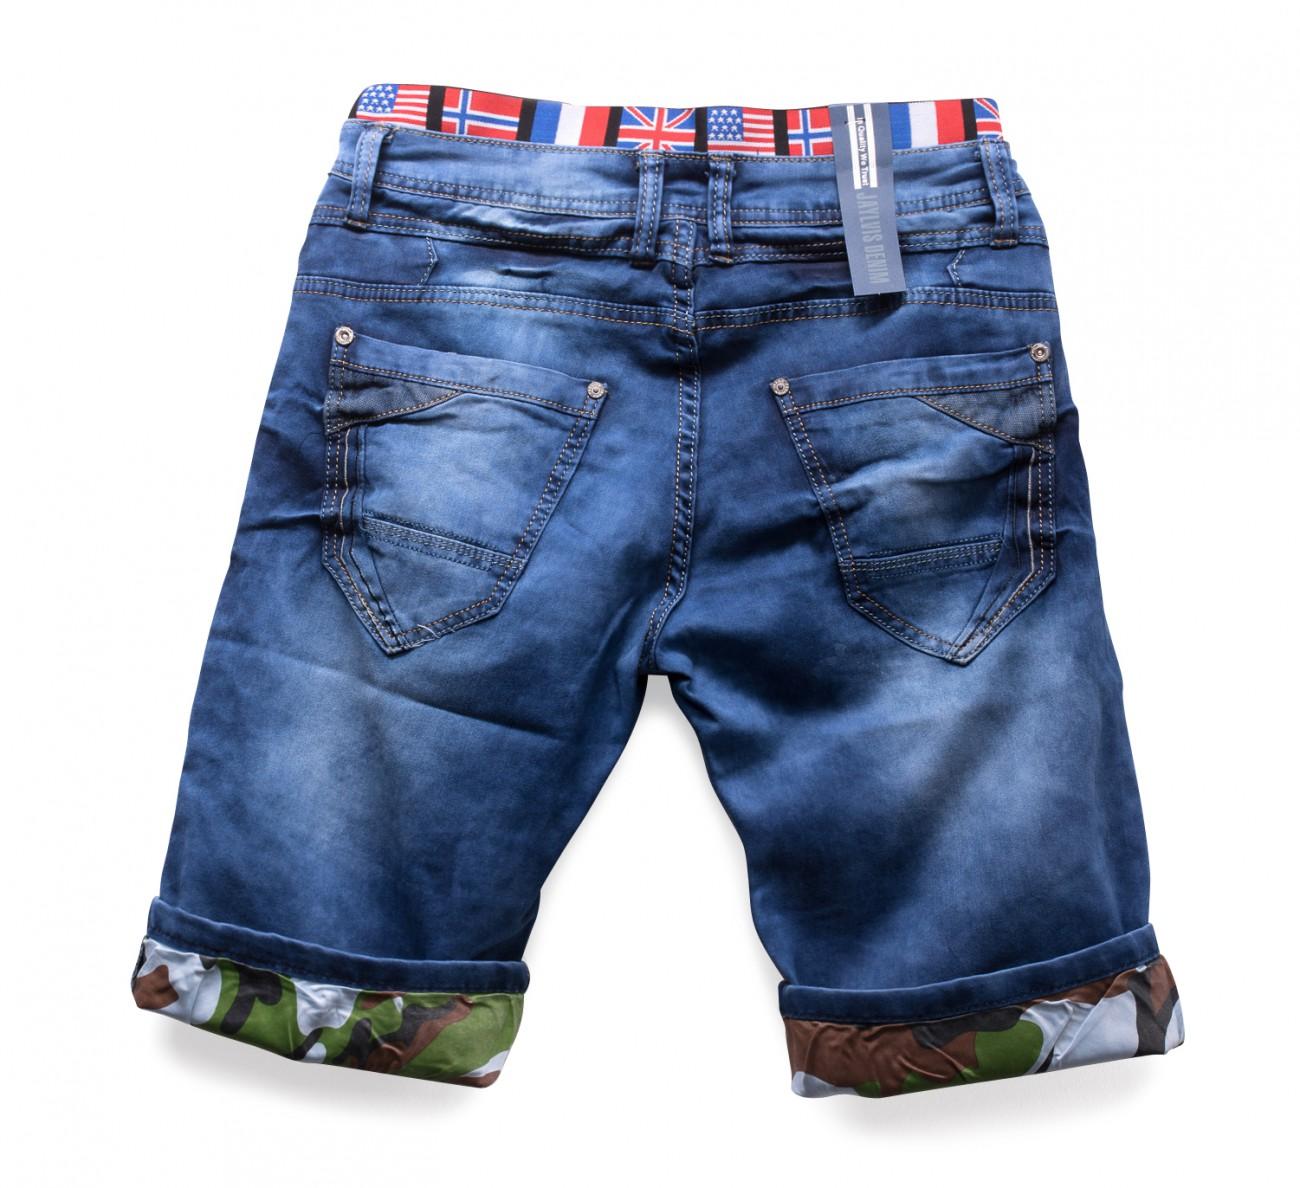 herren kurze hose dehnbar shorts stretch jeansshorts flagg denim ebay. Black Bedroom Furniture Sets. Home Design Ideas